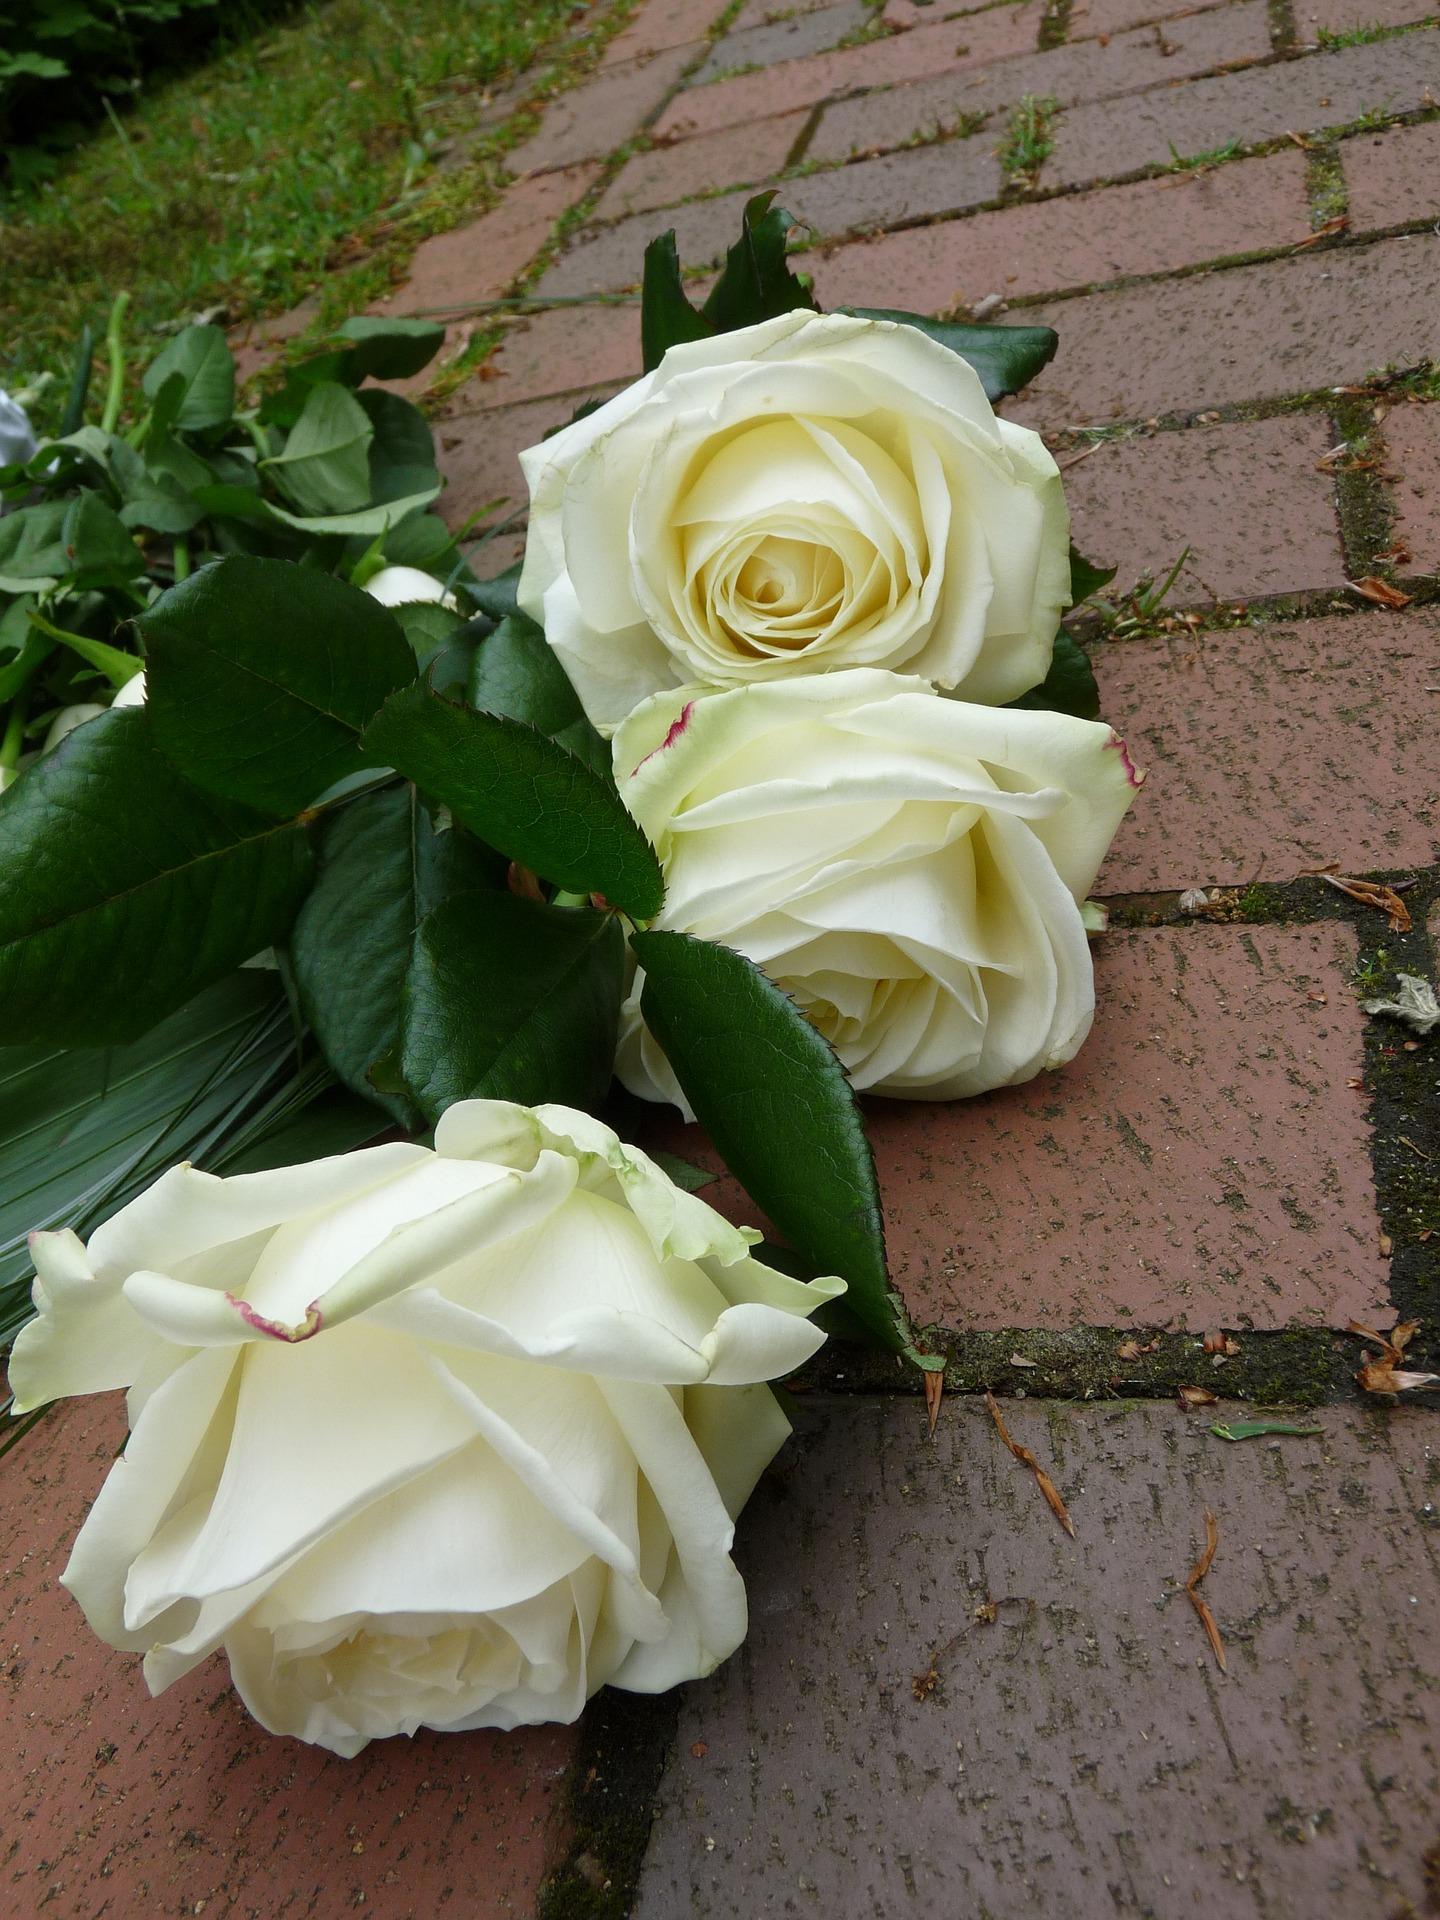 Wausau Area Obituaries March 20 Wausau Pilot Review